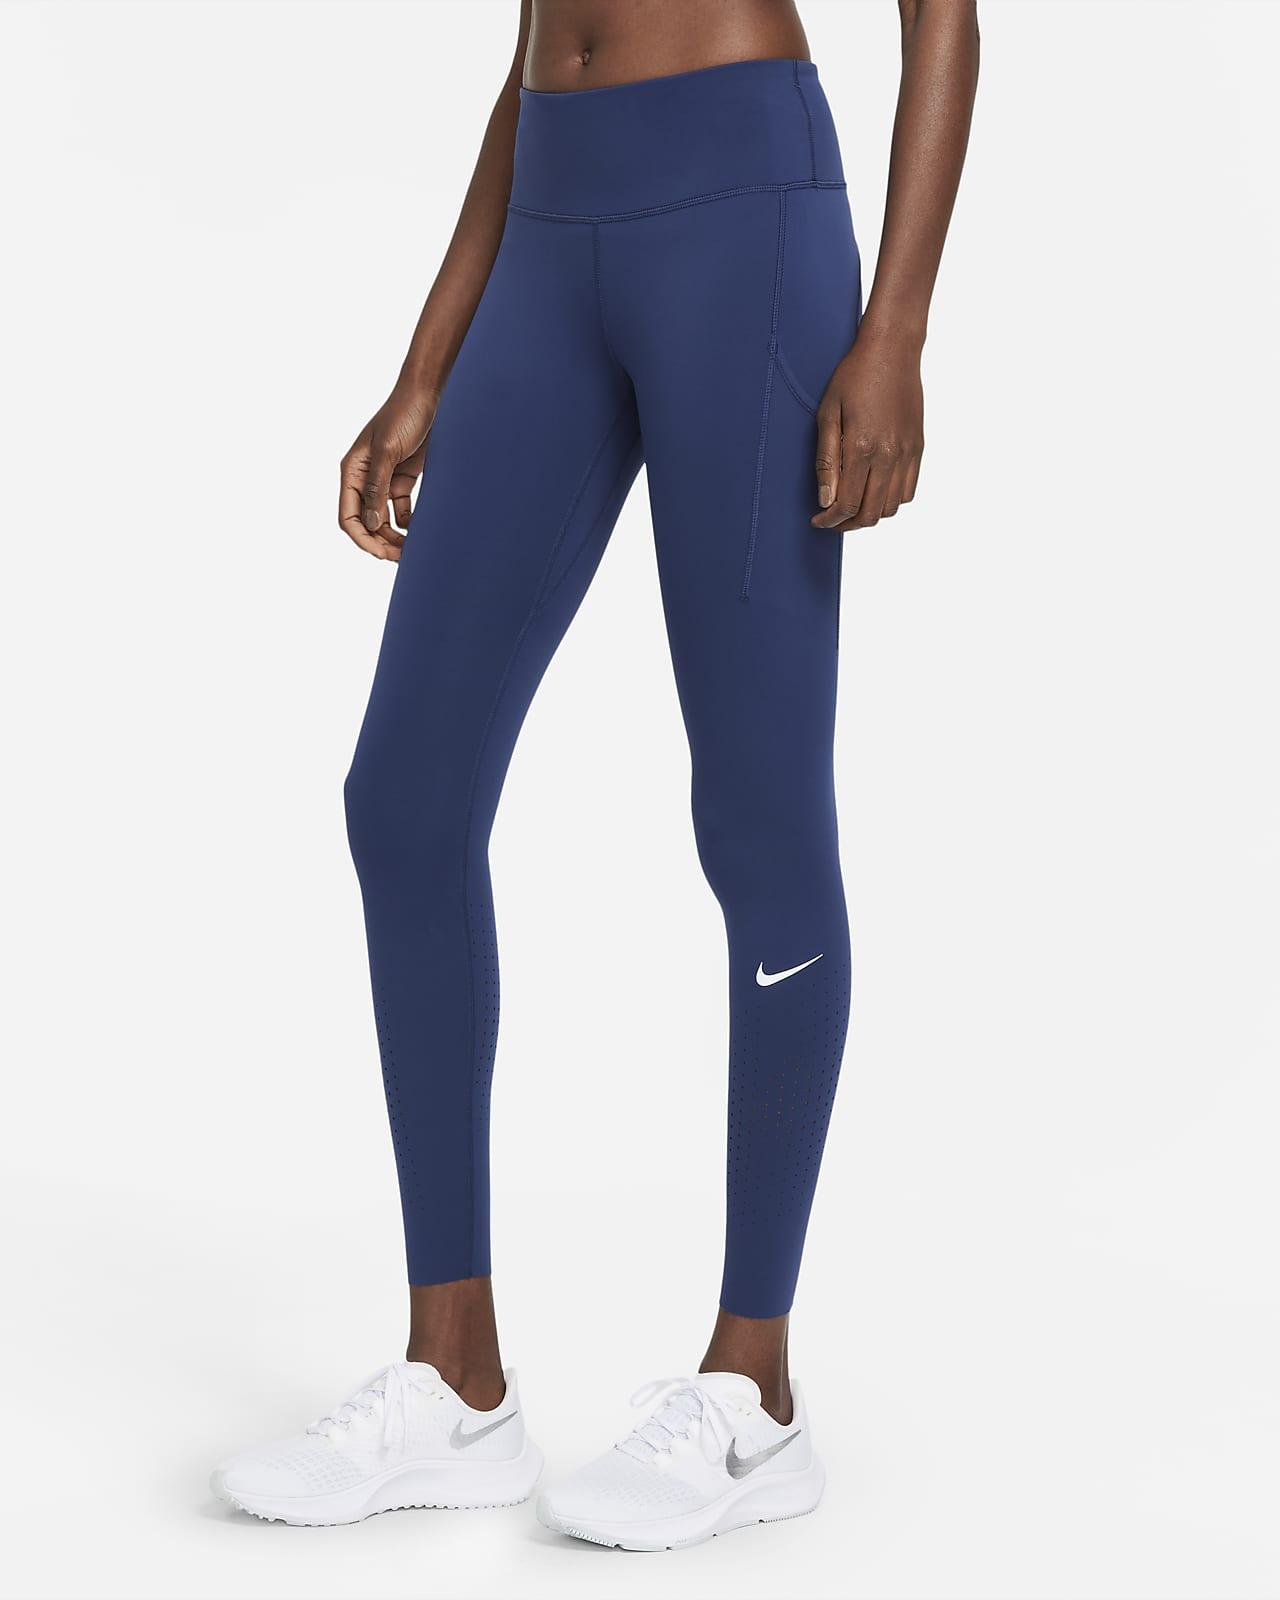 Legging de running taille mi-basse Nike Epic Luxe pour Femme